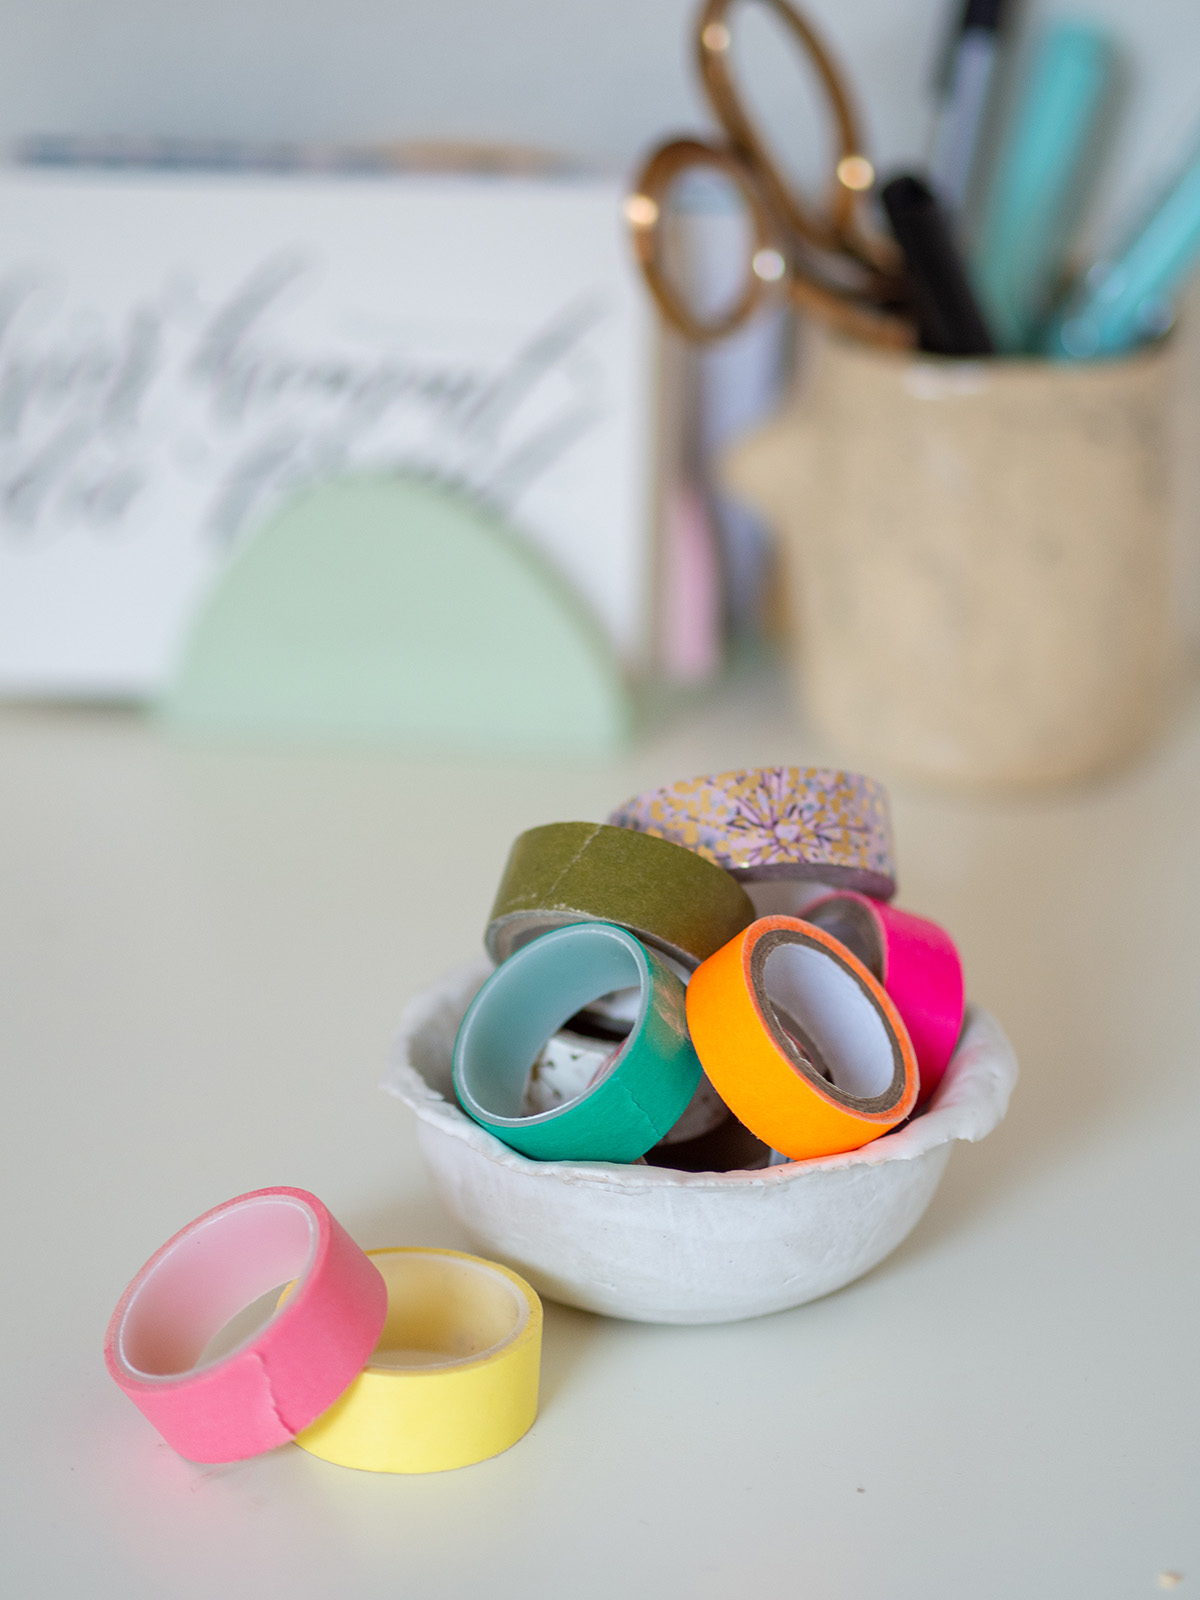 missredfox - On your creative table - Johanna Rundel 5